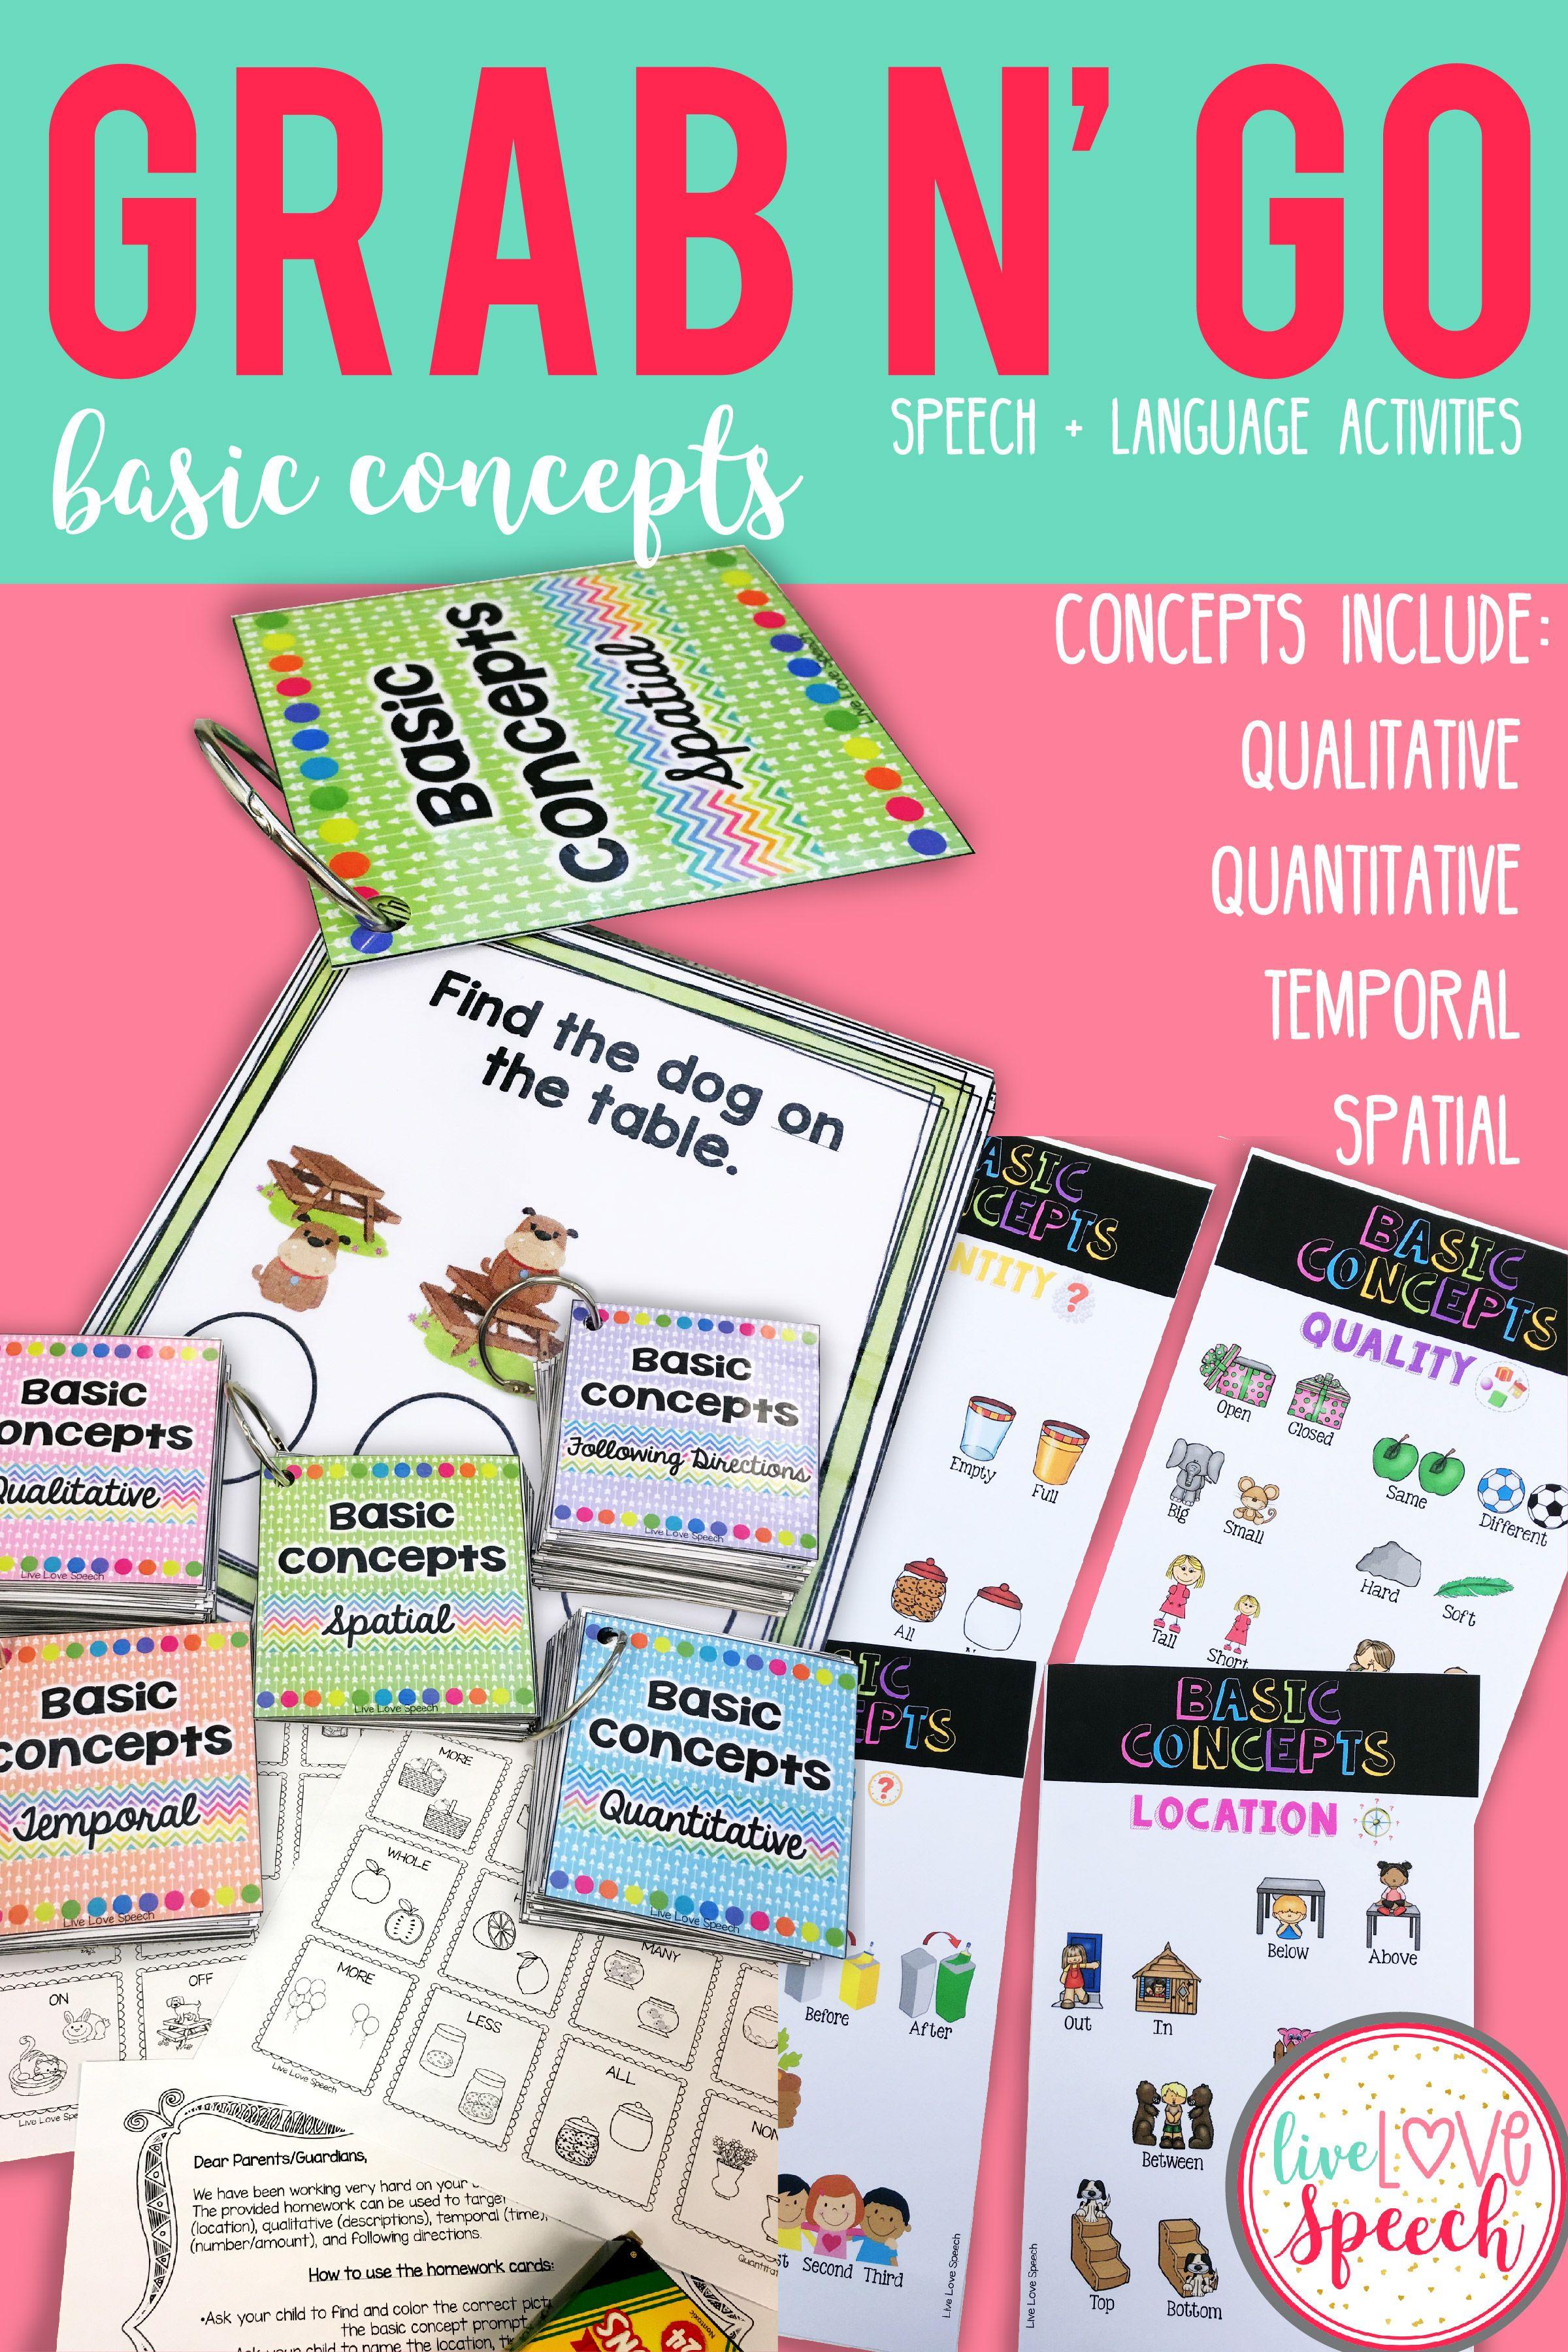 Grab N Go Basic Concepts Temporal Spatial Qualitative